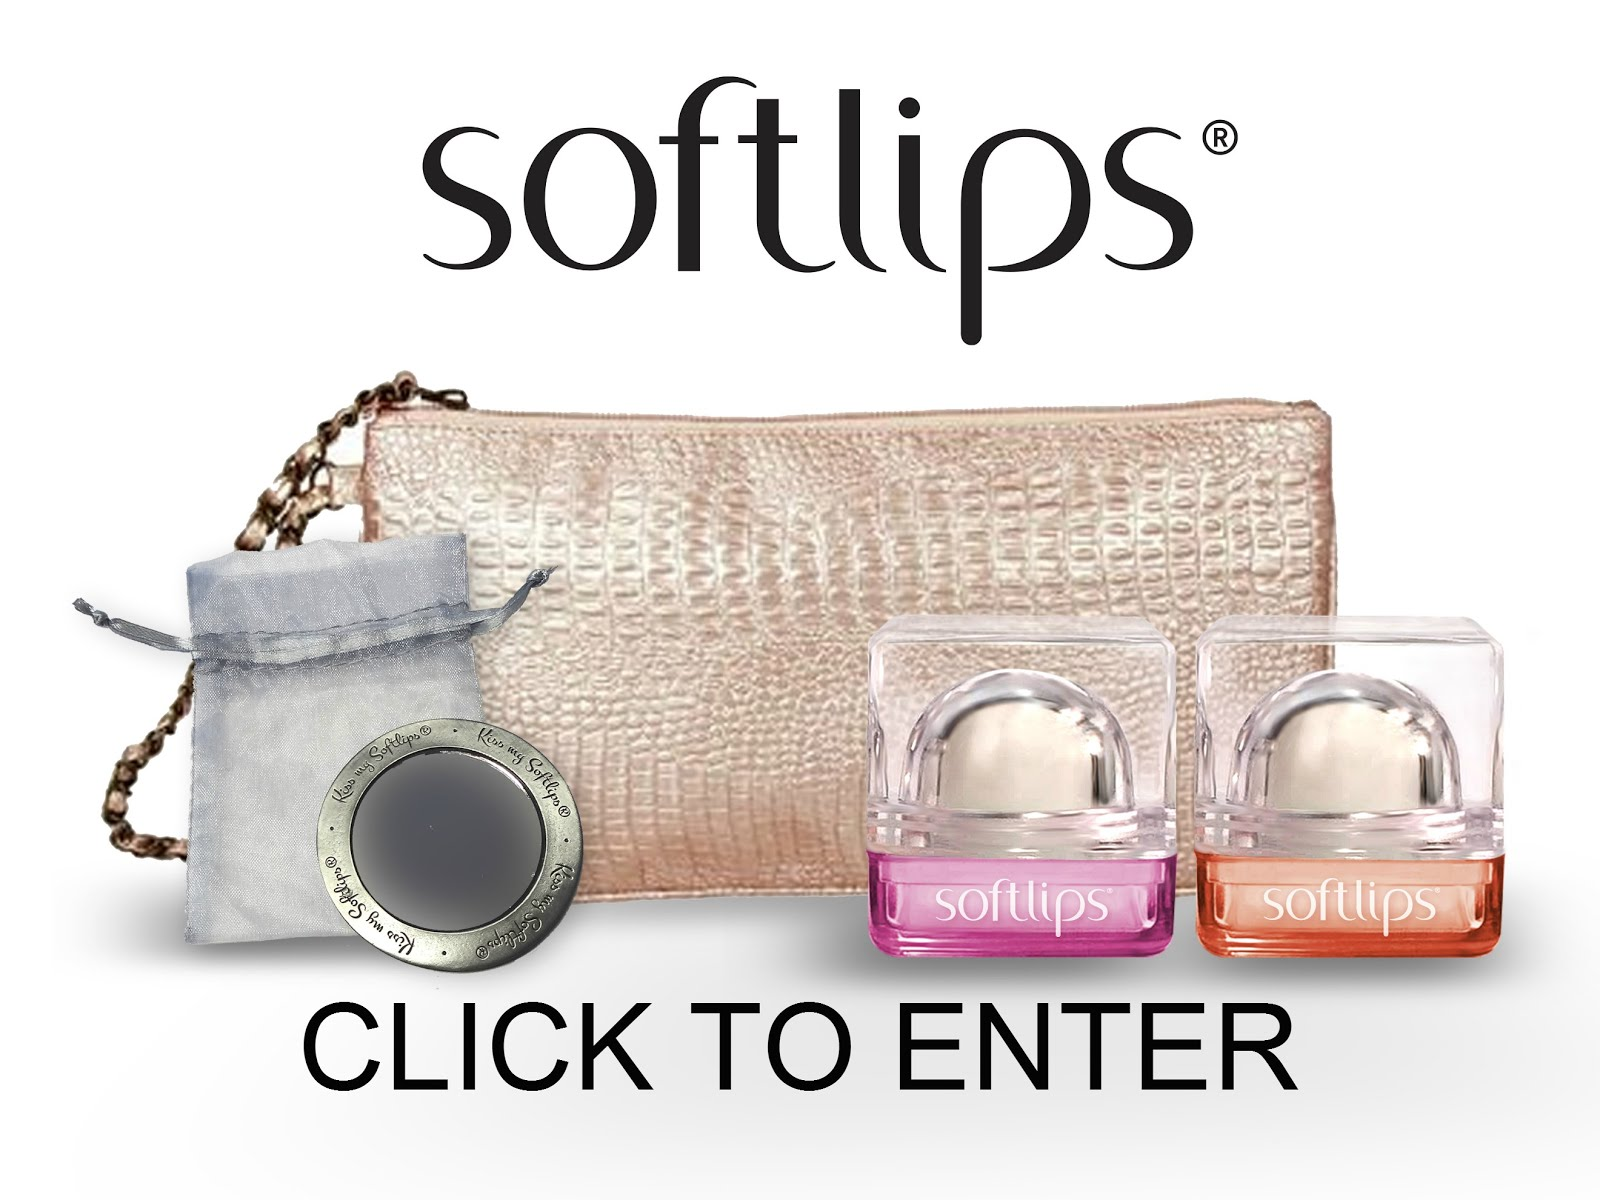 Softlips Giveaway